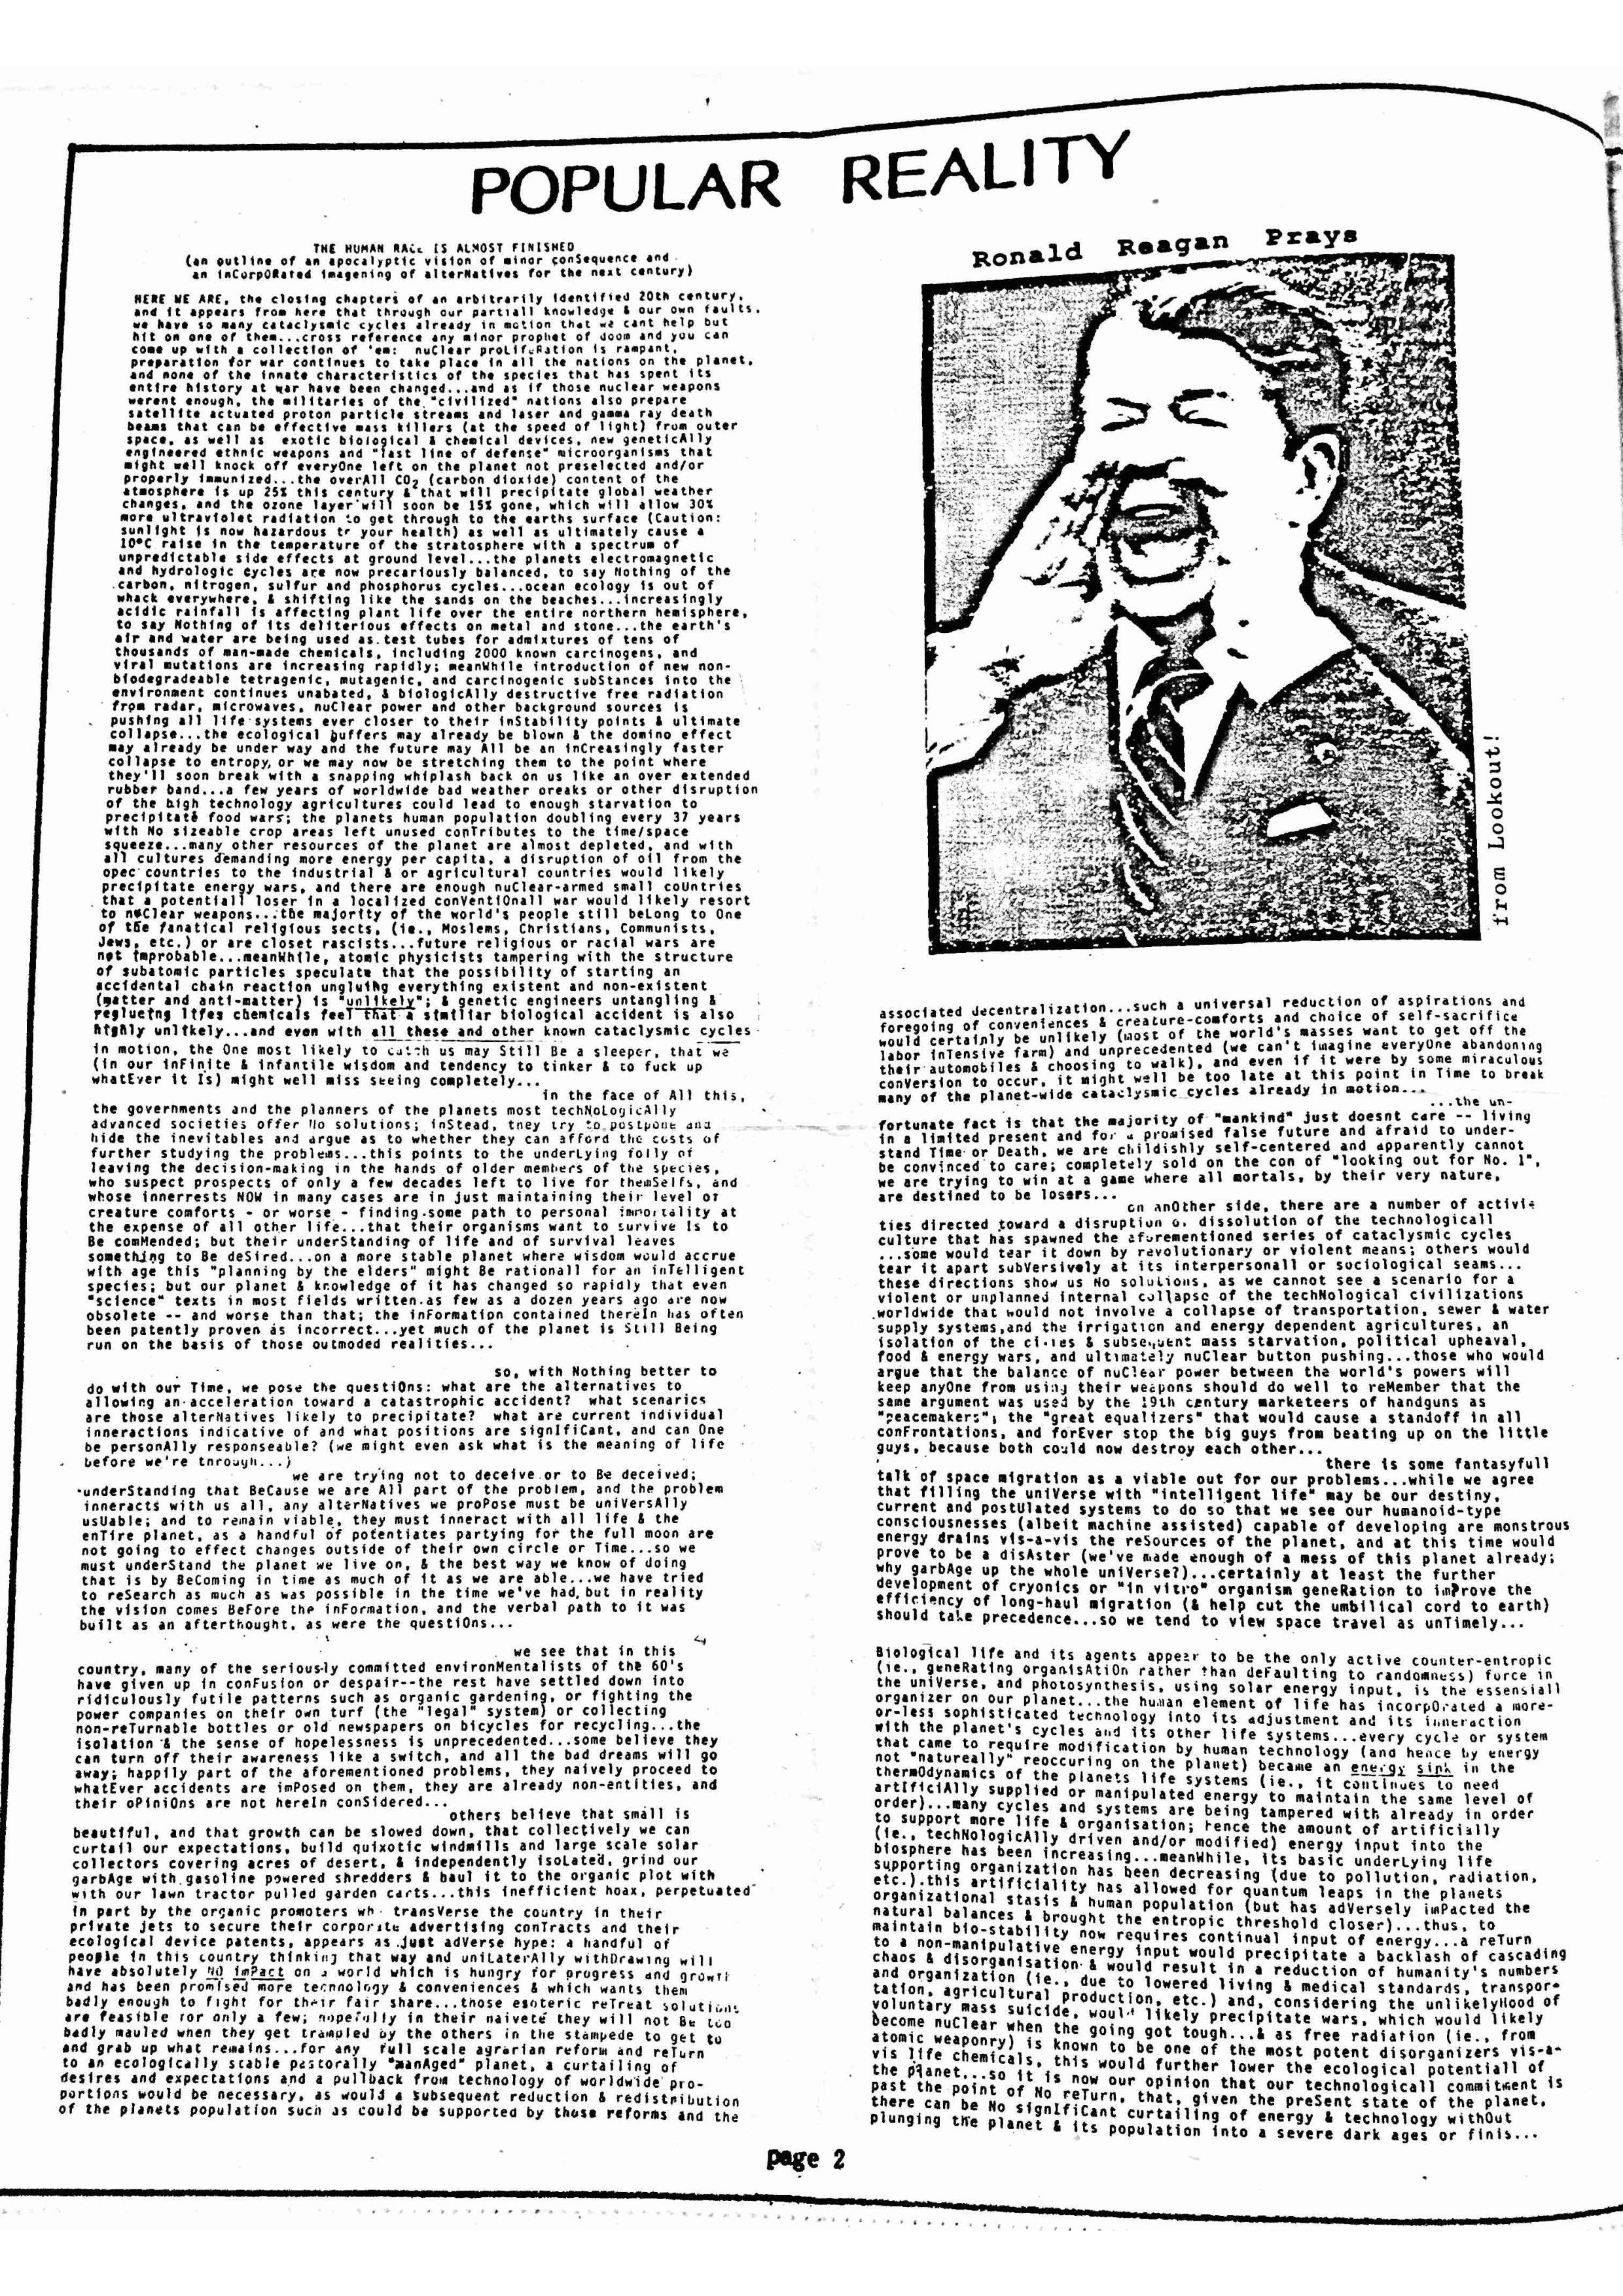 PopRealNo15-page-002.jpg